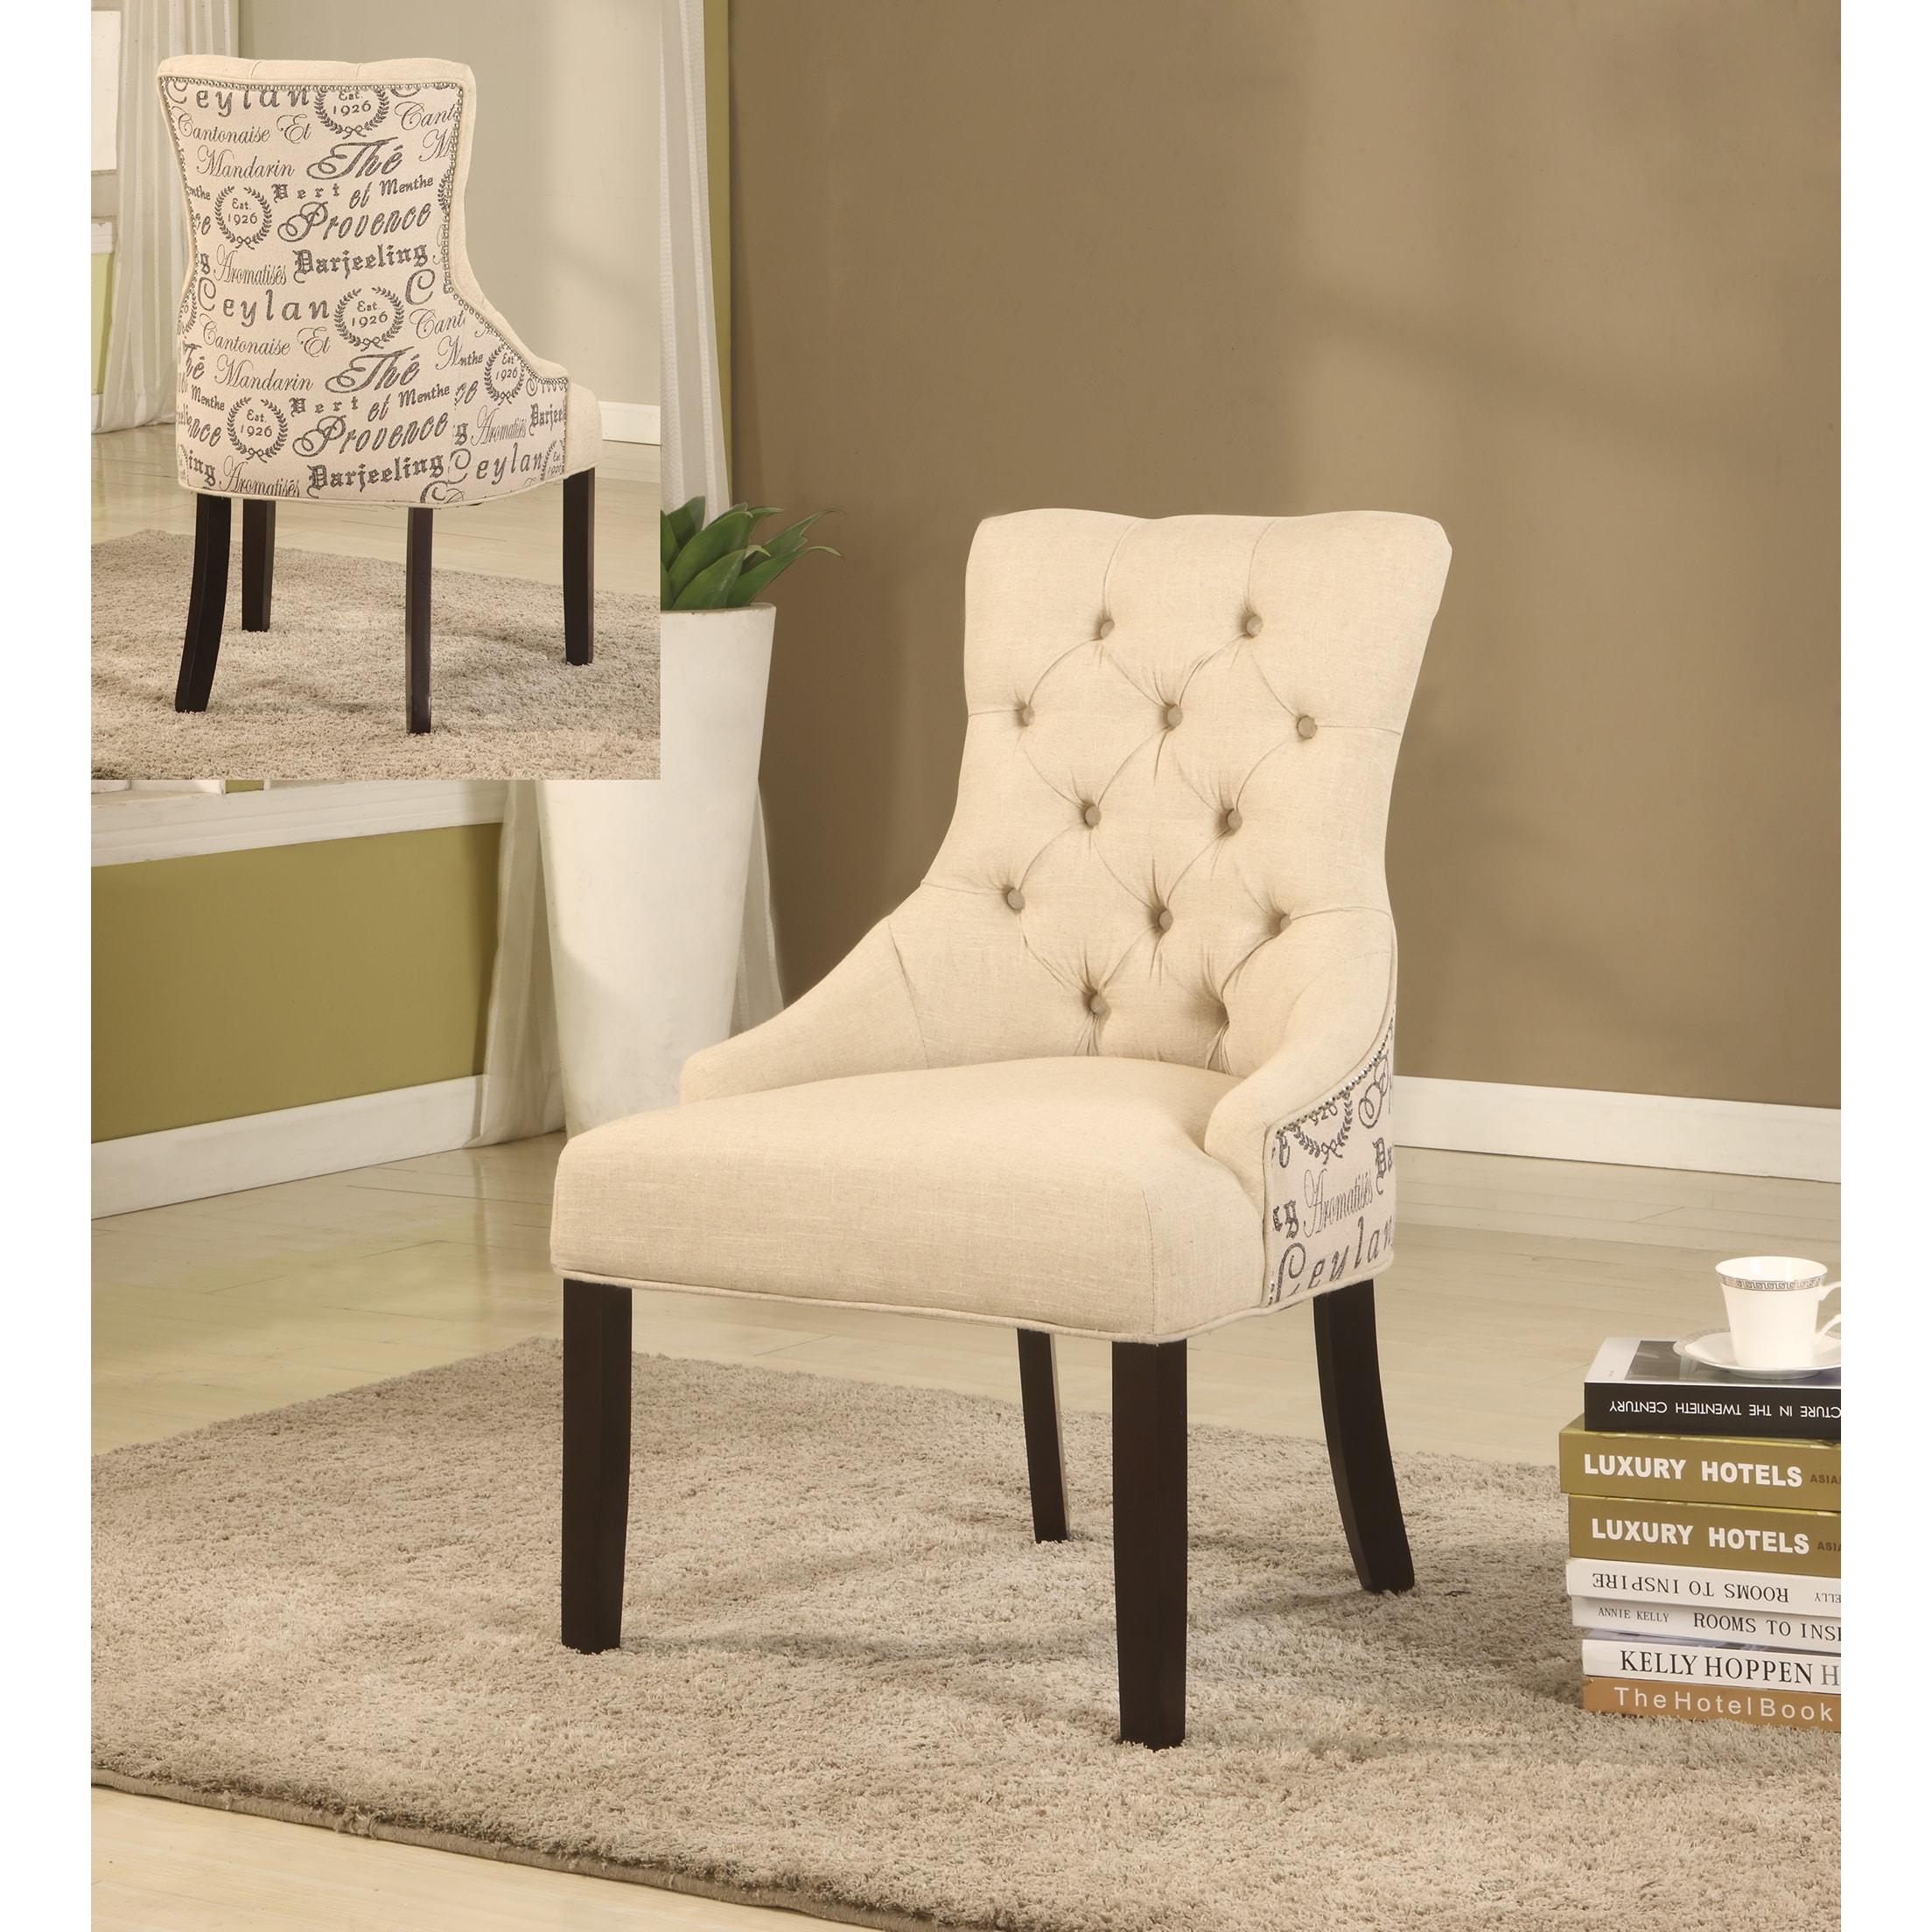 Best Master Furnitures Best Master Furniture Tufted Beige Accent Chair (Set of 2 Pcs)